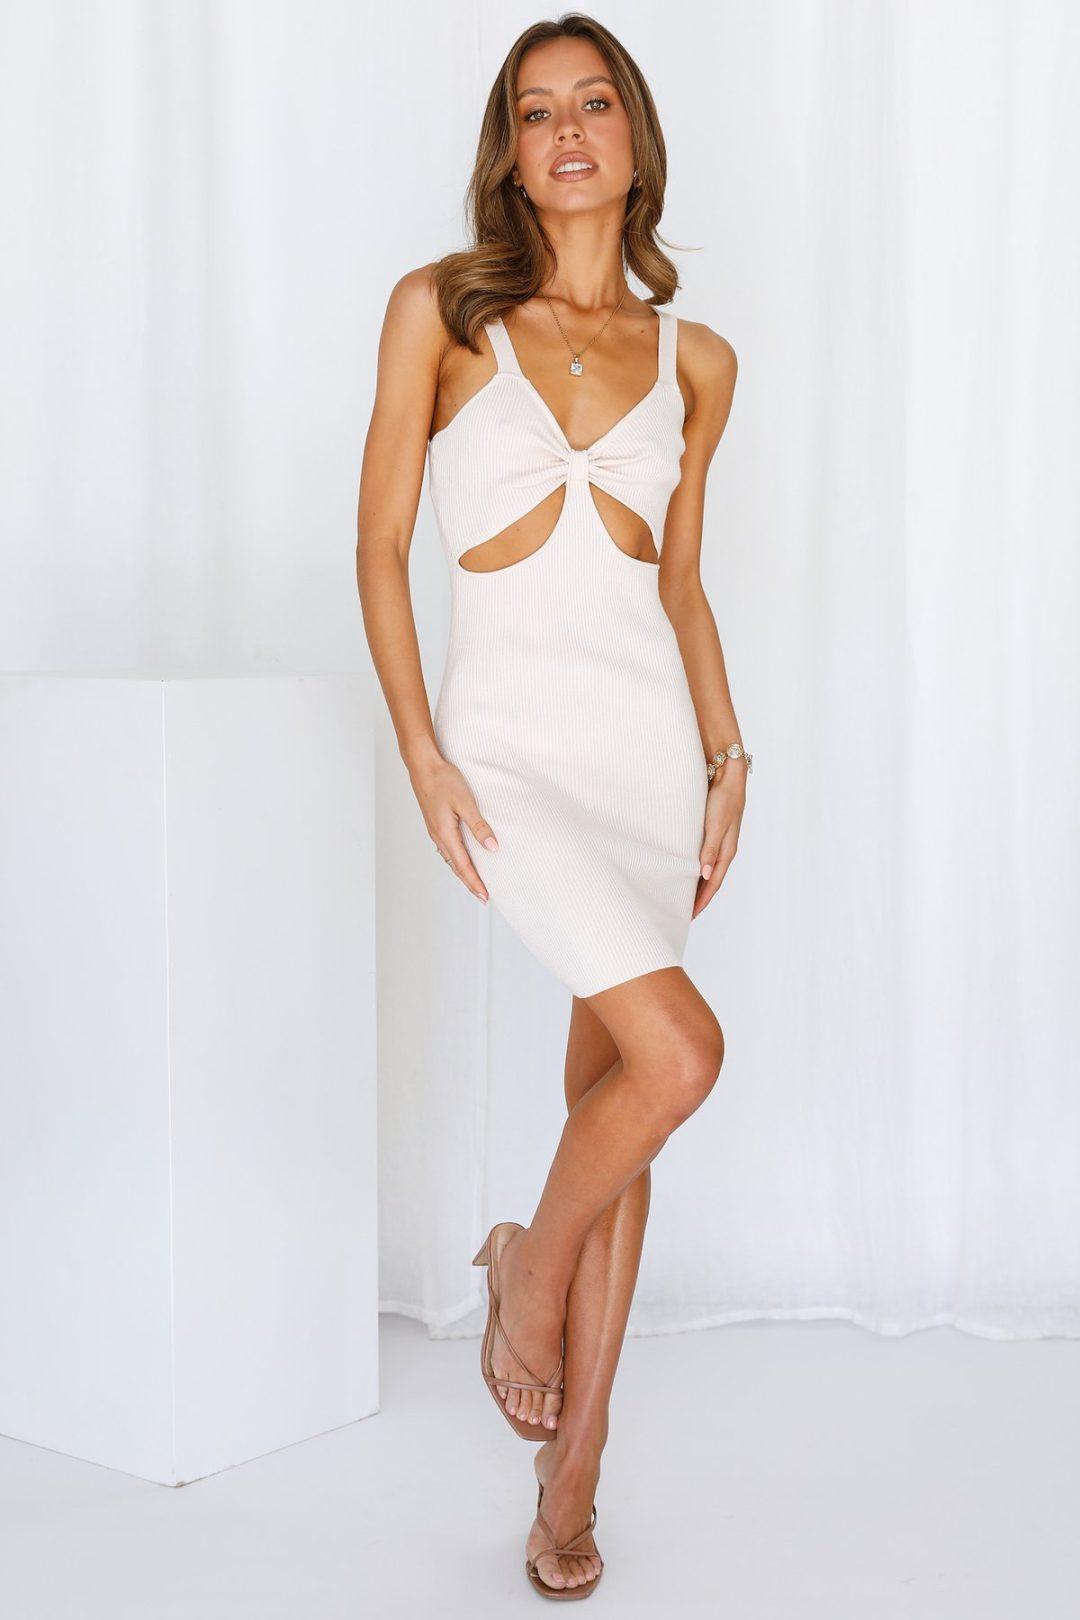 Sexy white cut-out dress